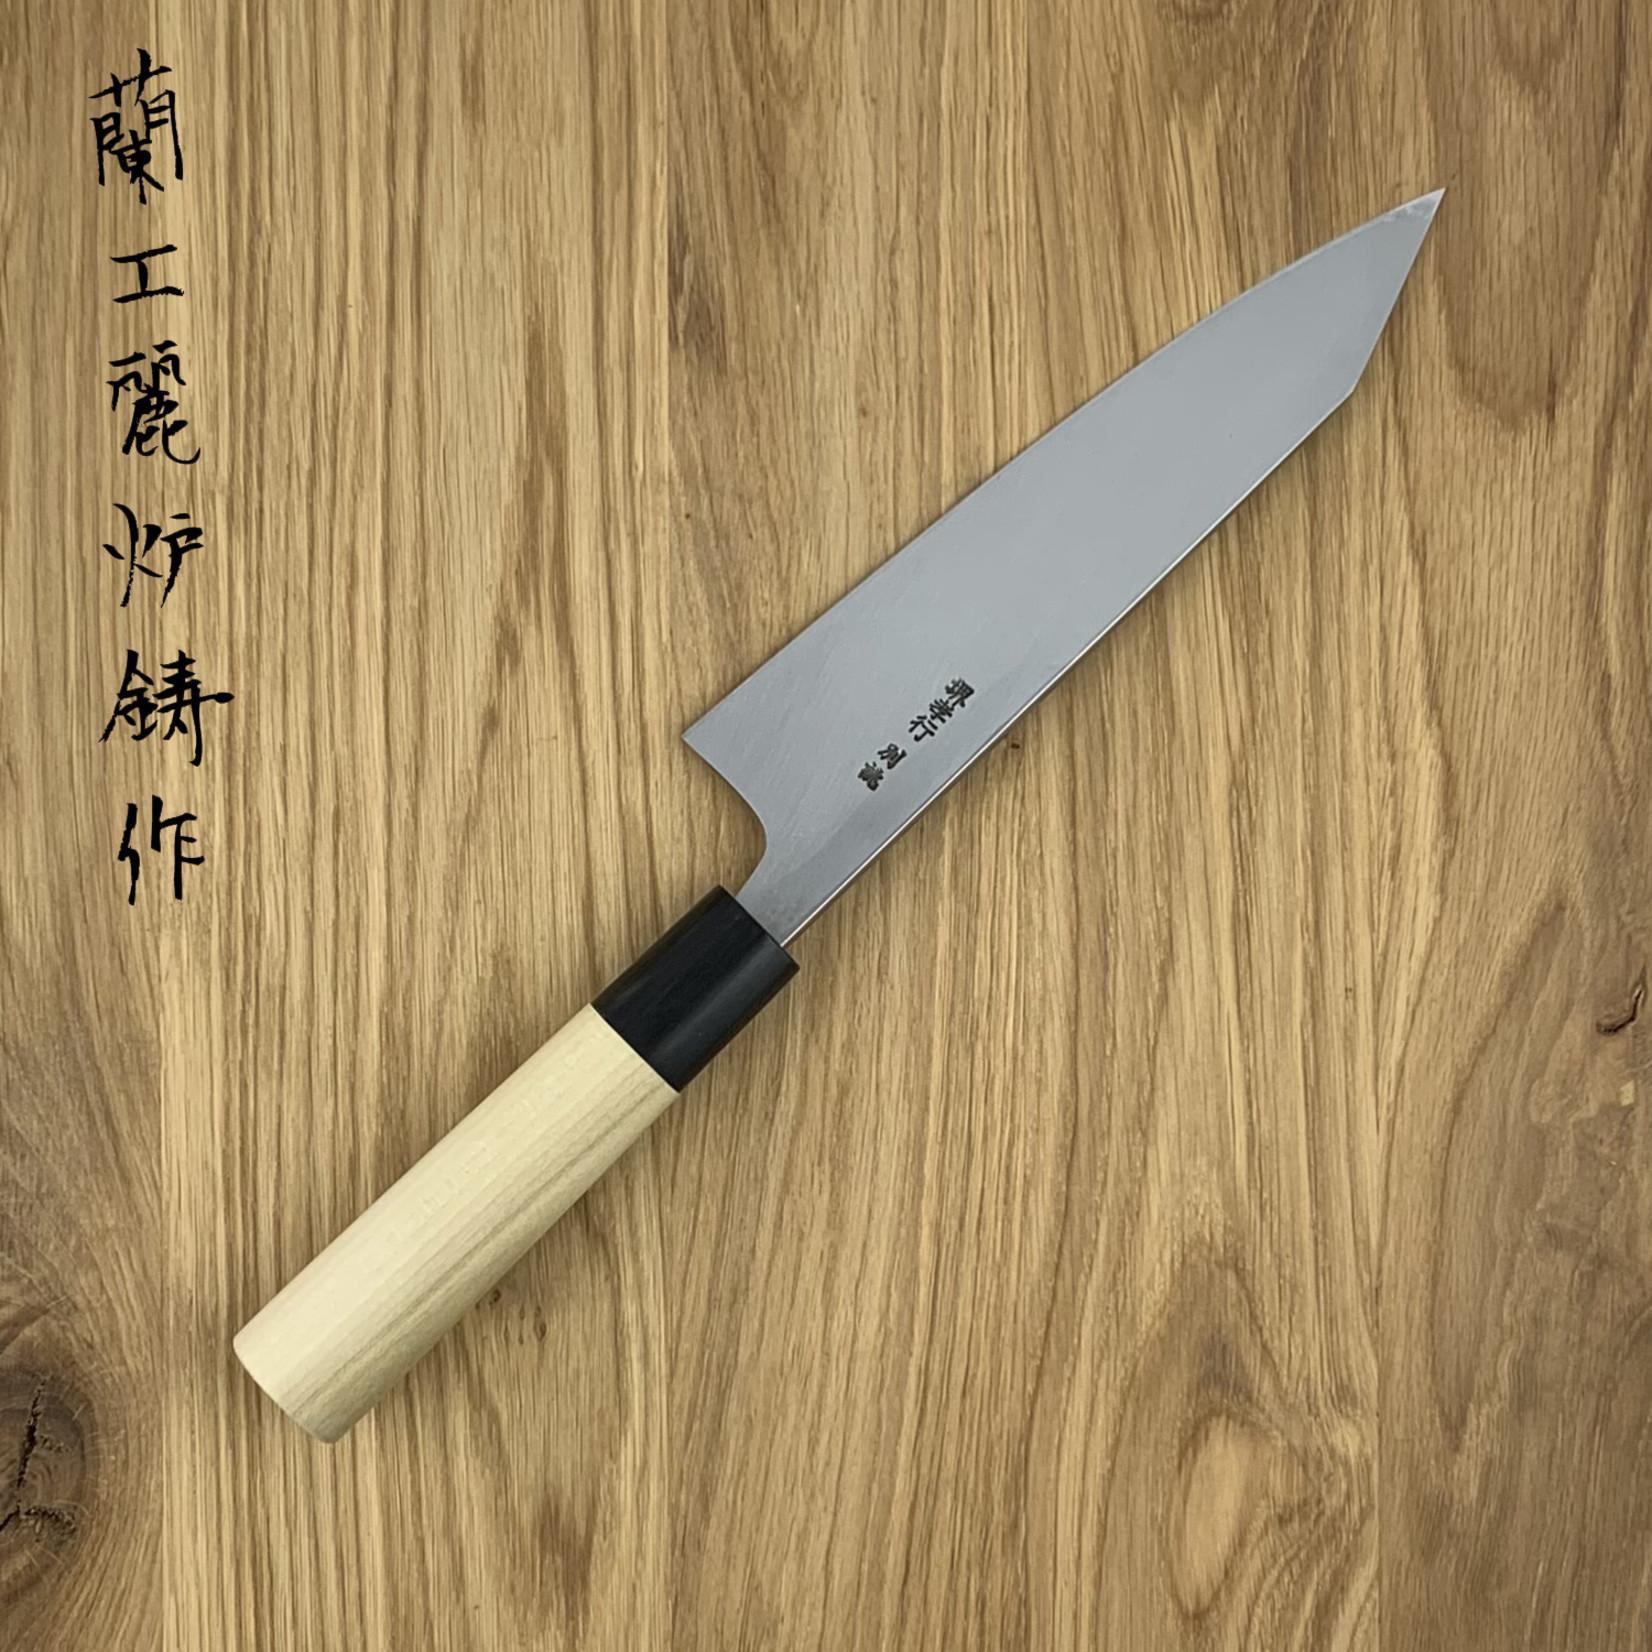 SAKAI TAKAYUKI Kiri Deba Tokujou White #2 Magnolia 180 mm 03196